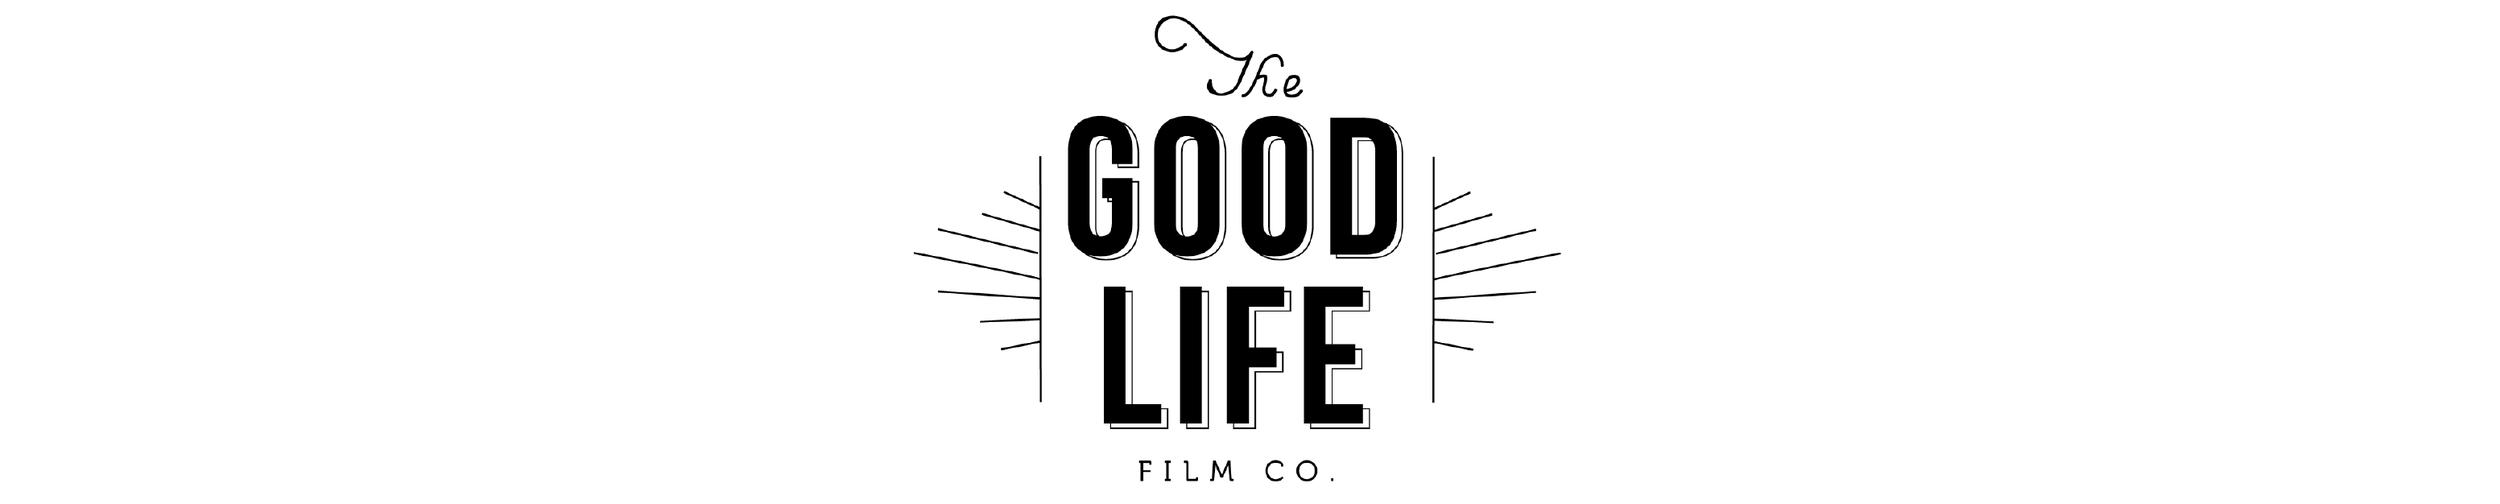 TheGoodLife-01.png